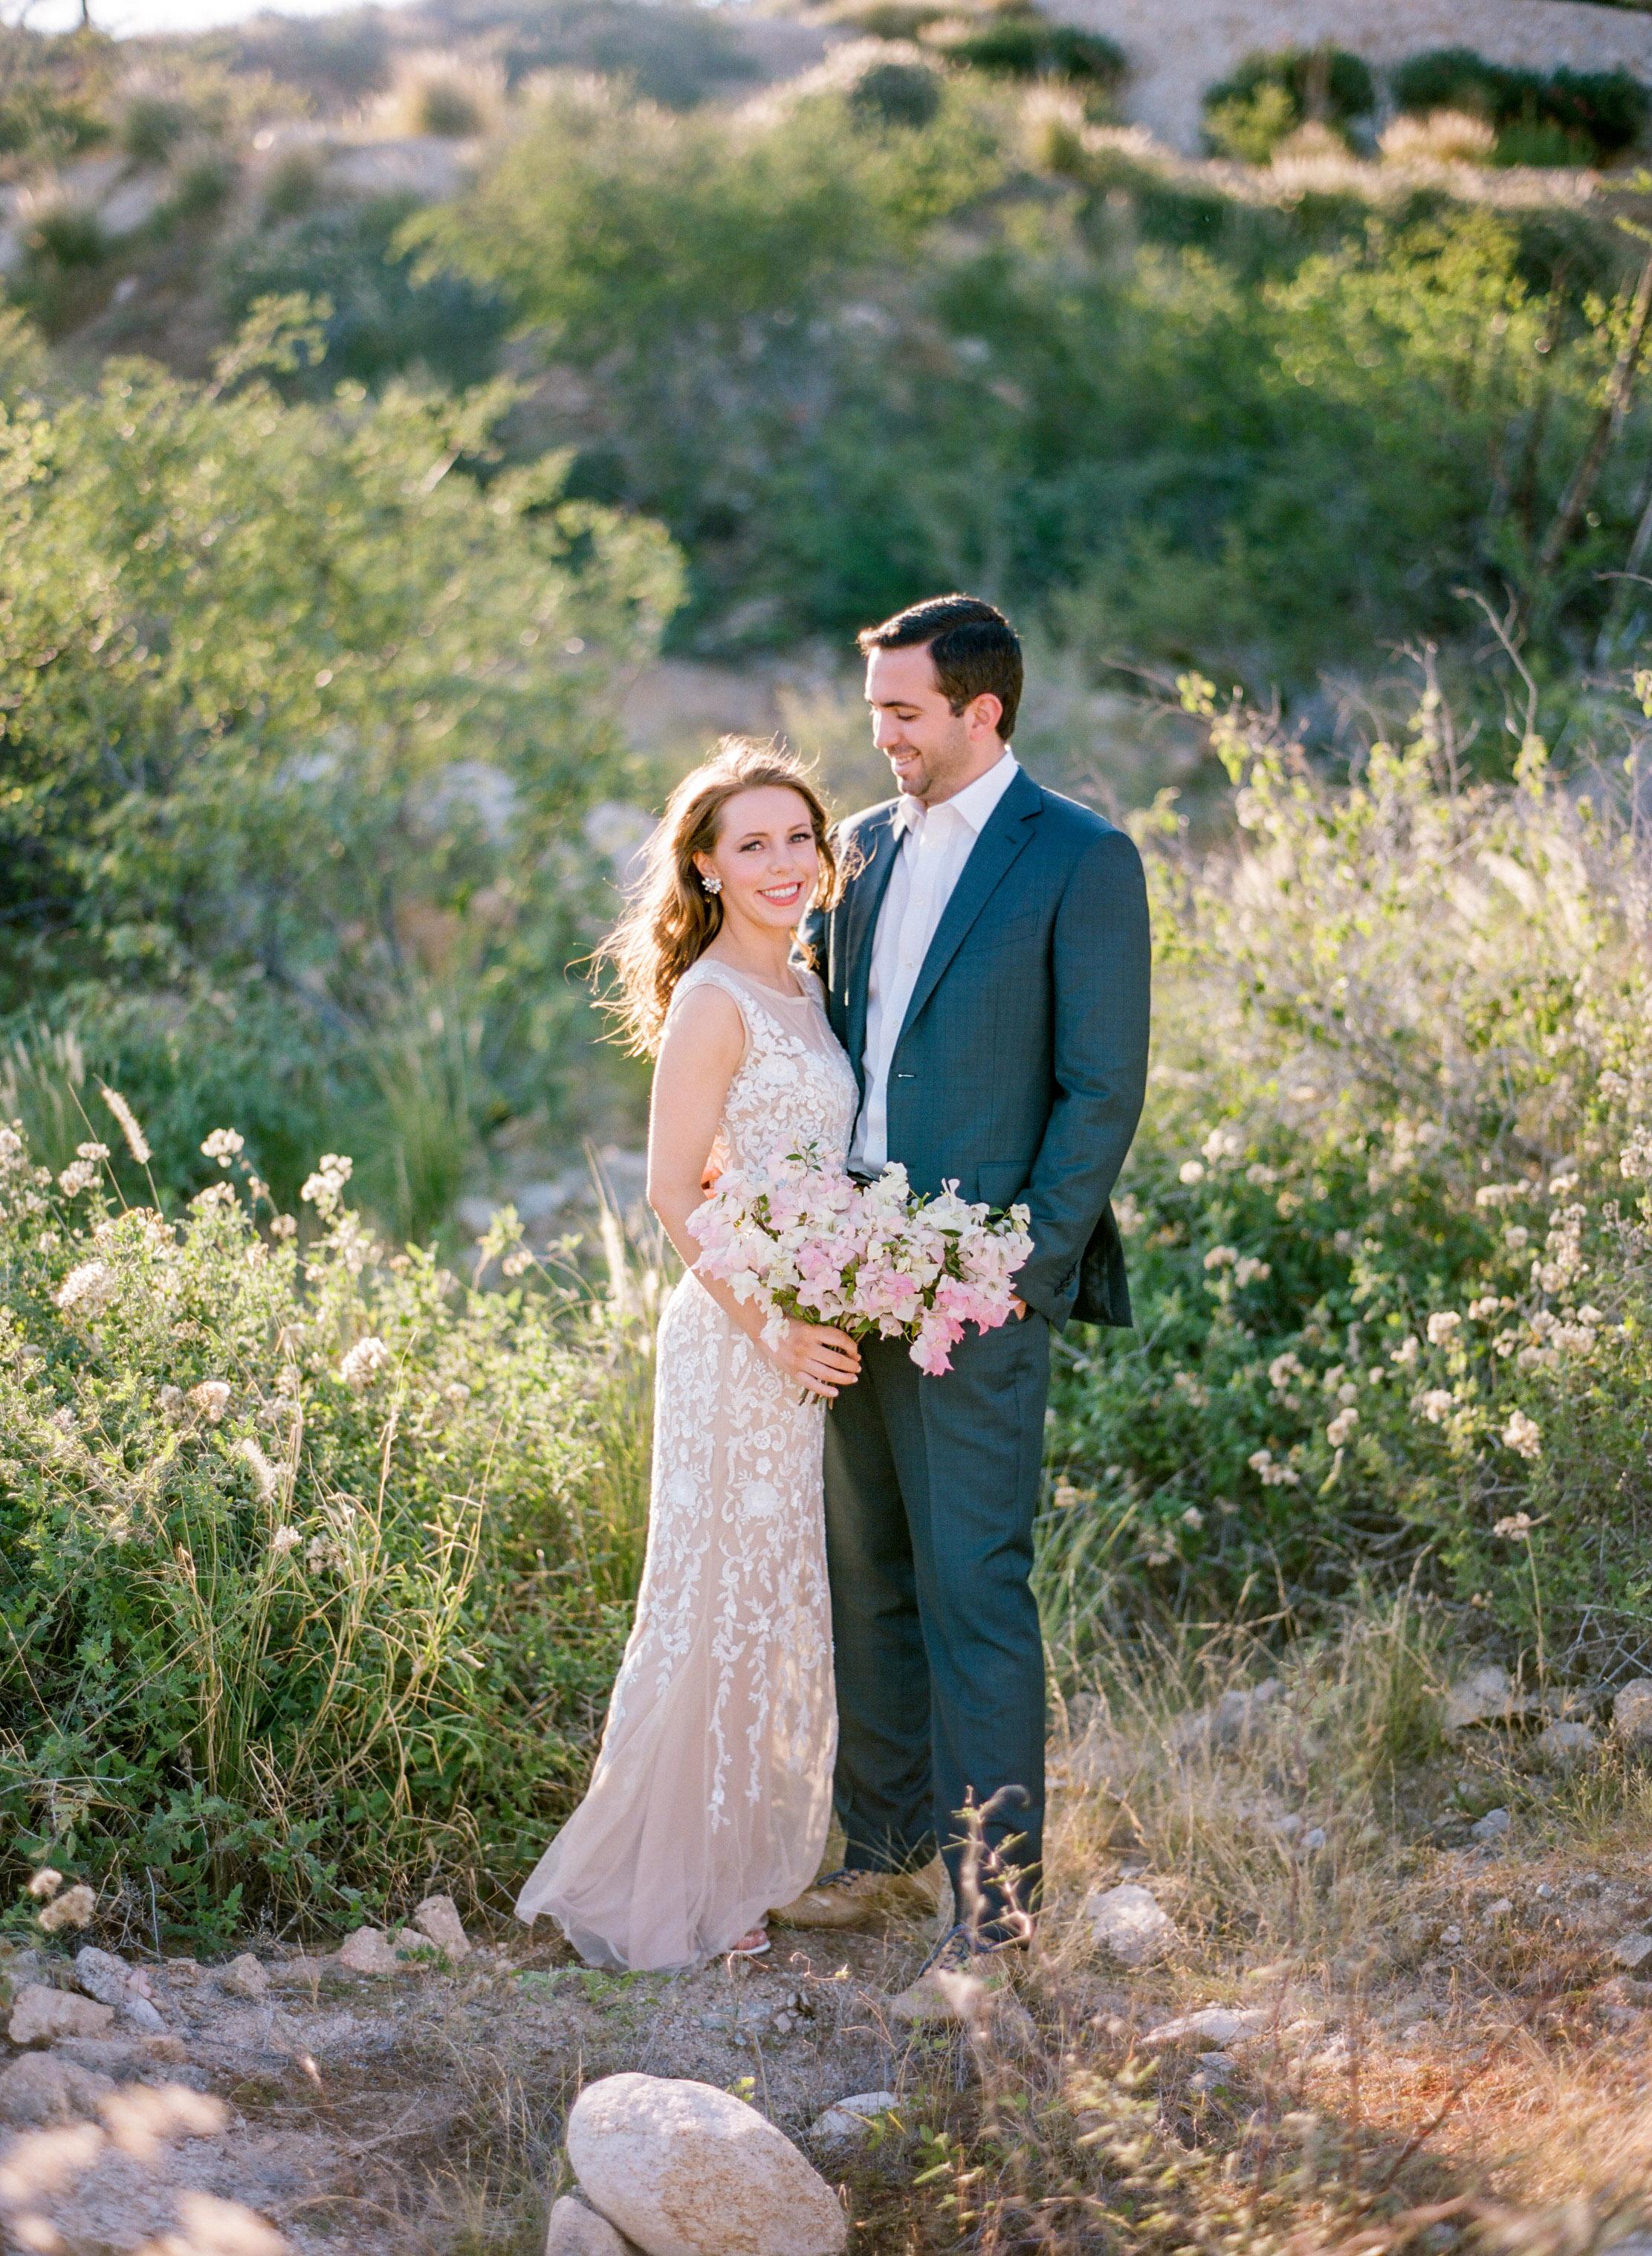 Dana-Fernandez-Photography-Destination-Wedding-Photographer-Cabo-San-Lucas-Film-Houston-Texas-Cabo-1.jpg